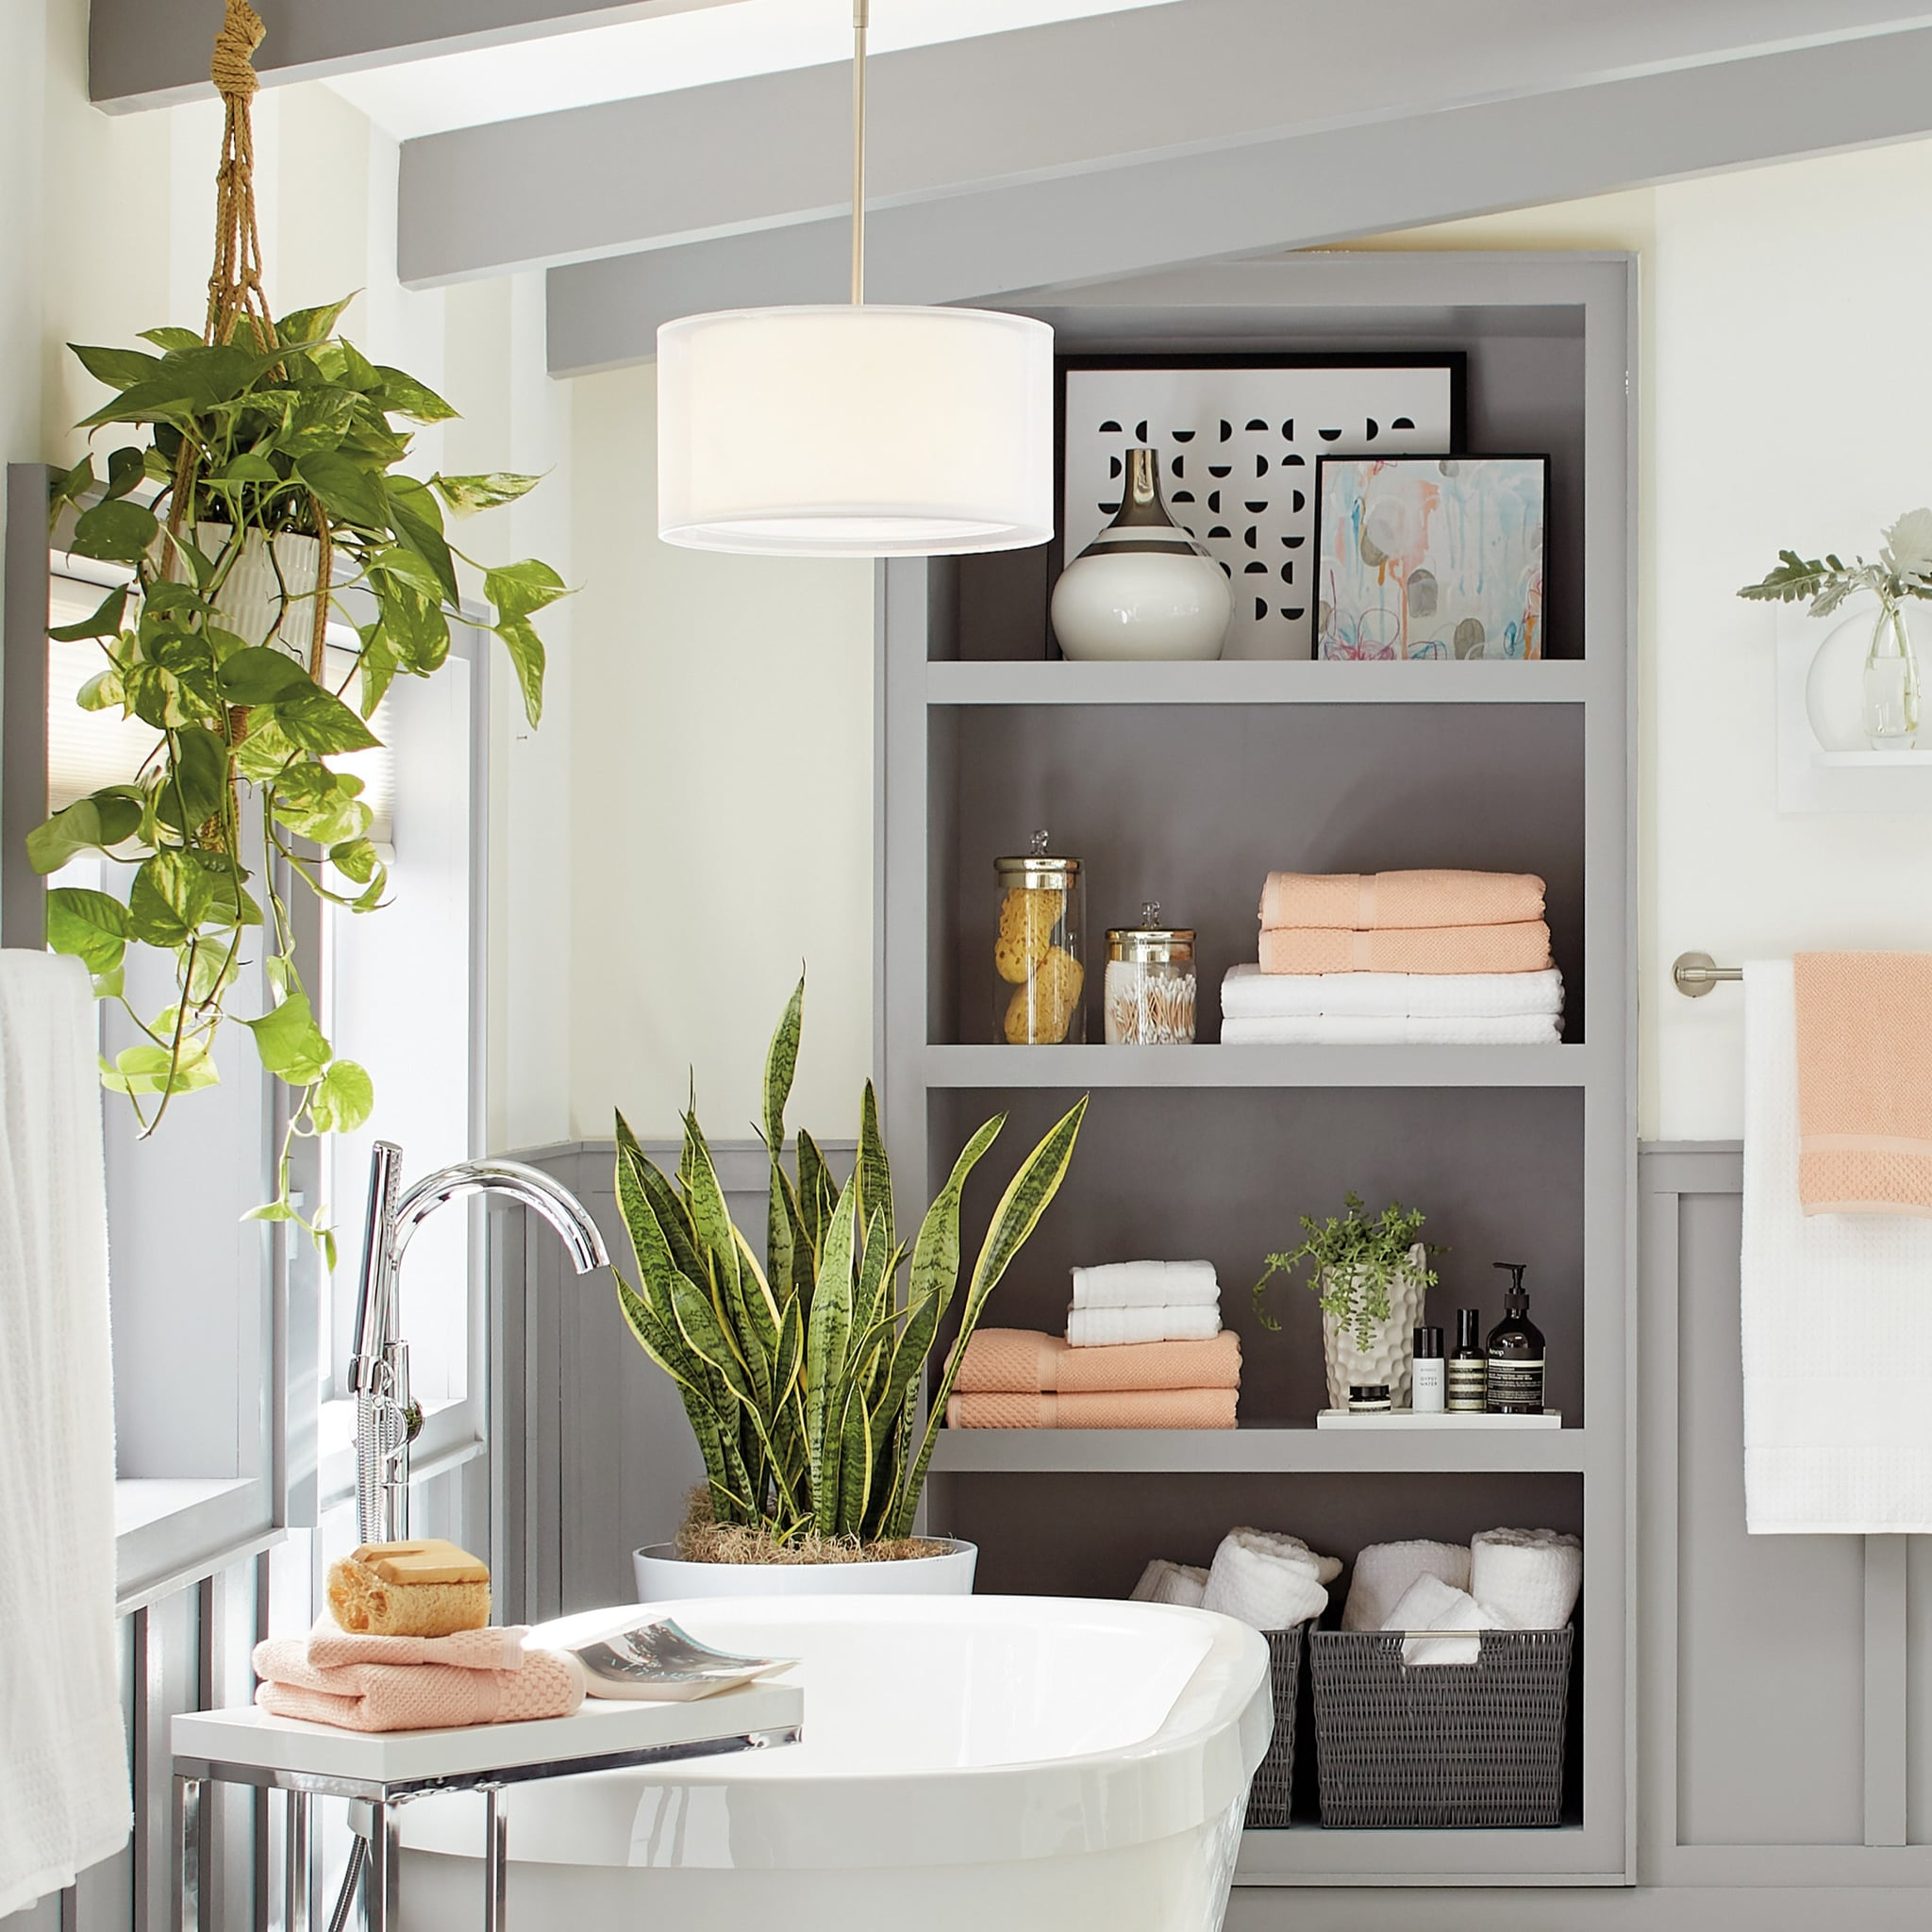 Bathroom Decor Inspiration 2019 Popsugar Smart Living,Black And White Wallpaper Anime Hd